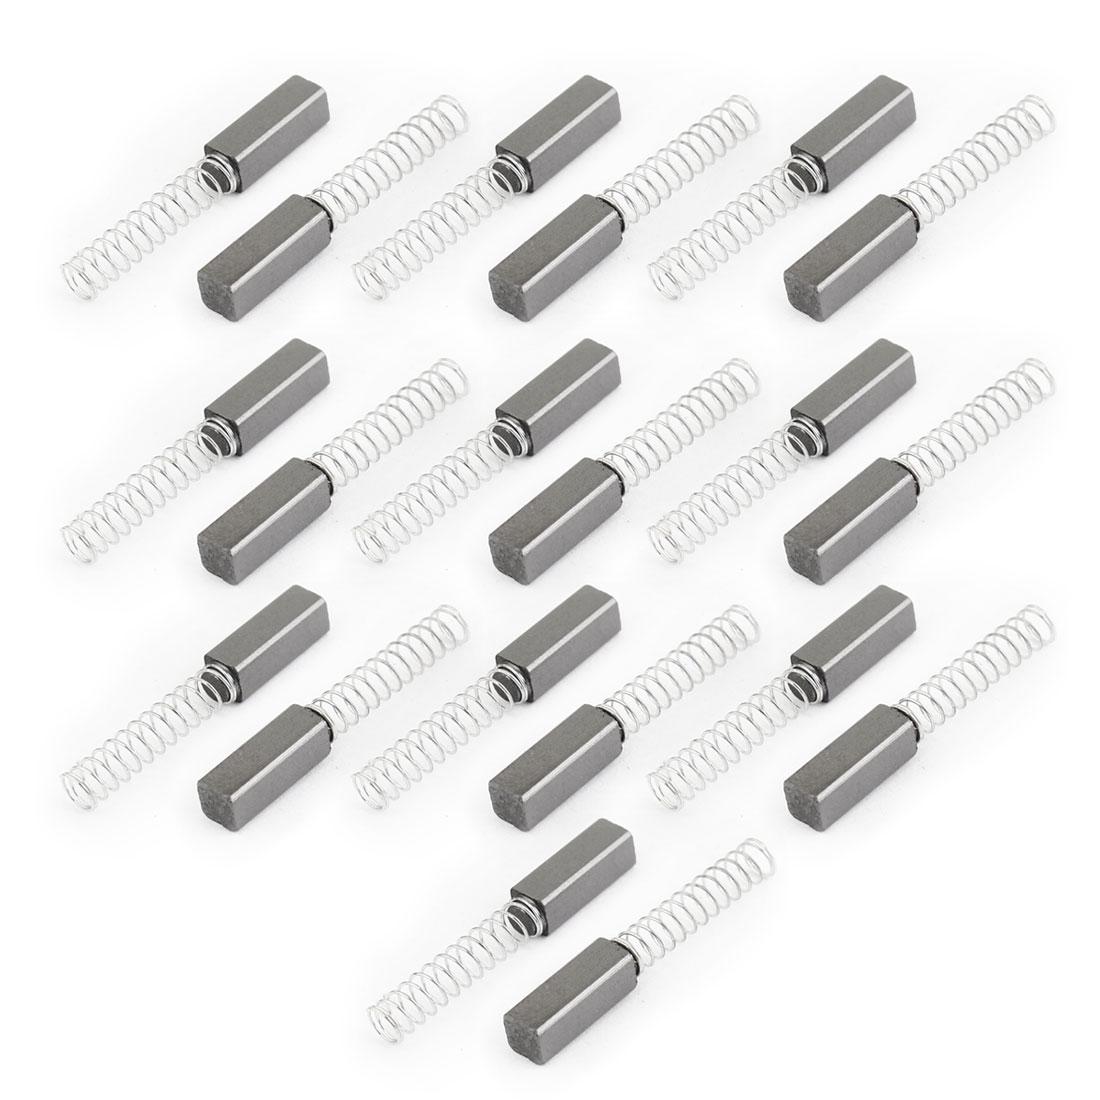 Dmiotech 20 Pcs Generic Electric Motor Carbon Brush Cb56 . | 10mm | 11mm | 4mm | 5mm | 6mm | 7mm | 8mm dmiotech 20 pcs motor carbon brushes for electric drill 10mm 11mm 12mm 5 5mm 5mm 6mm 8mm